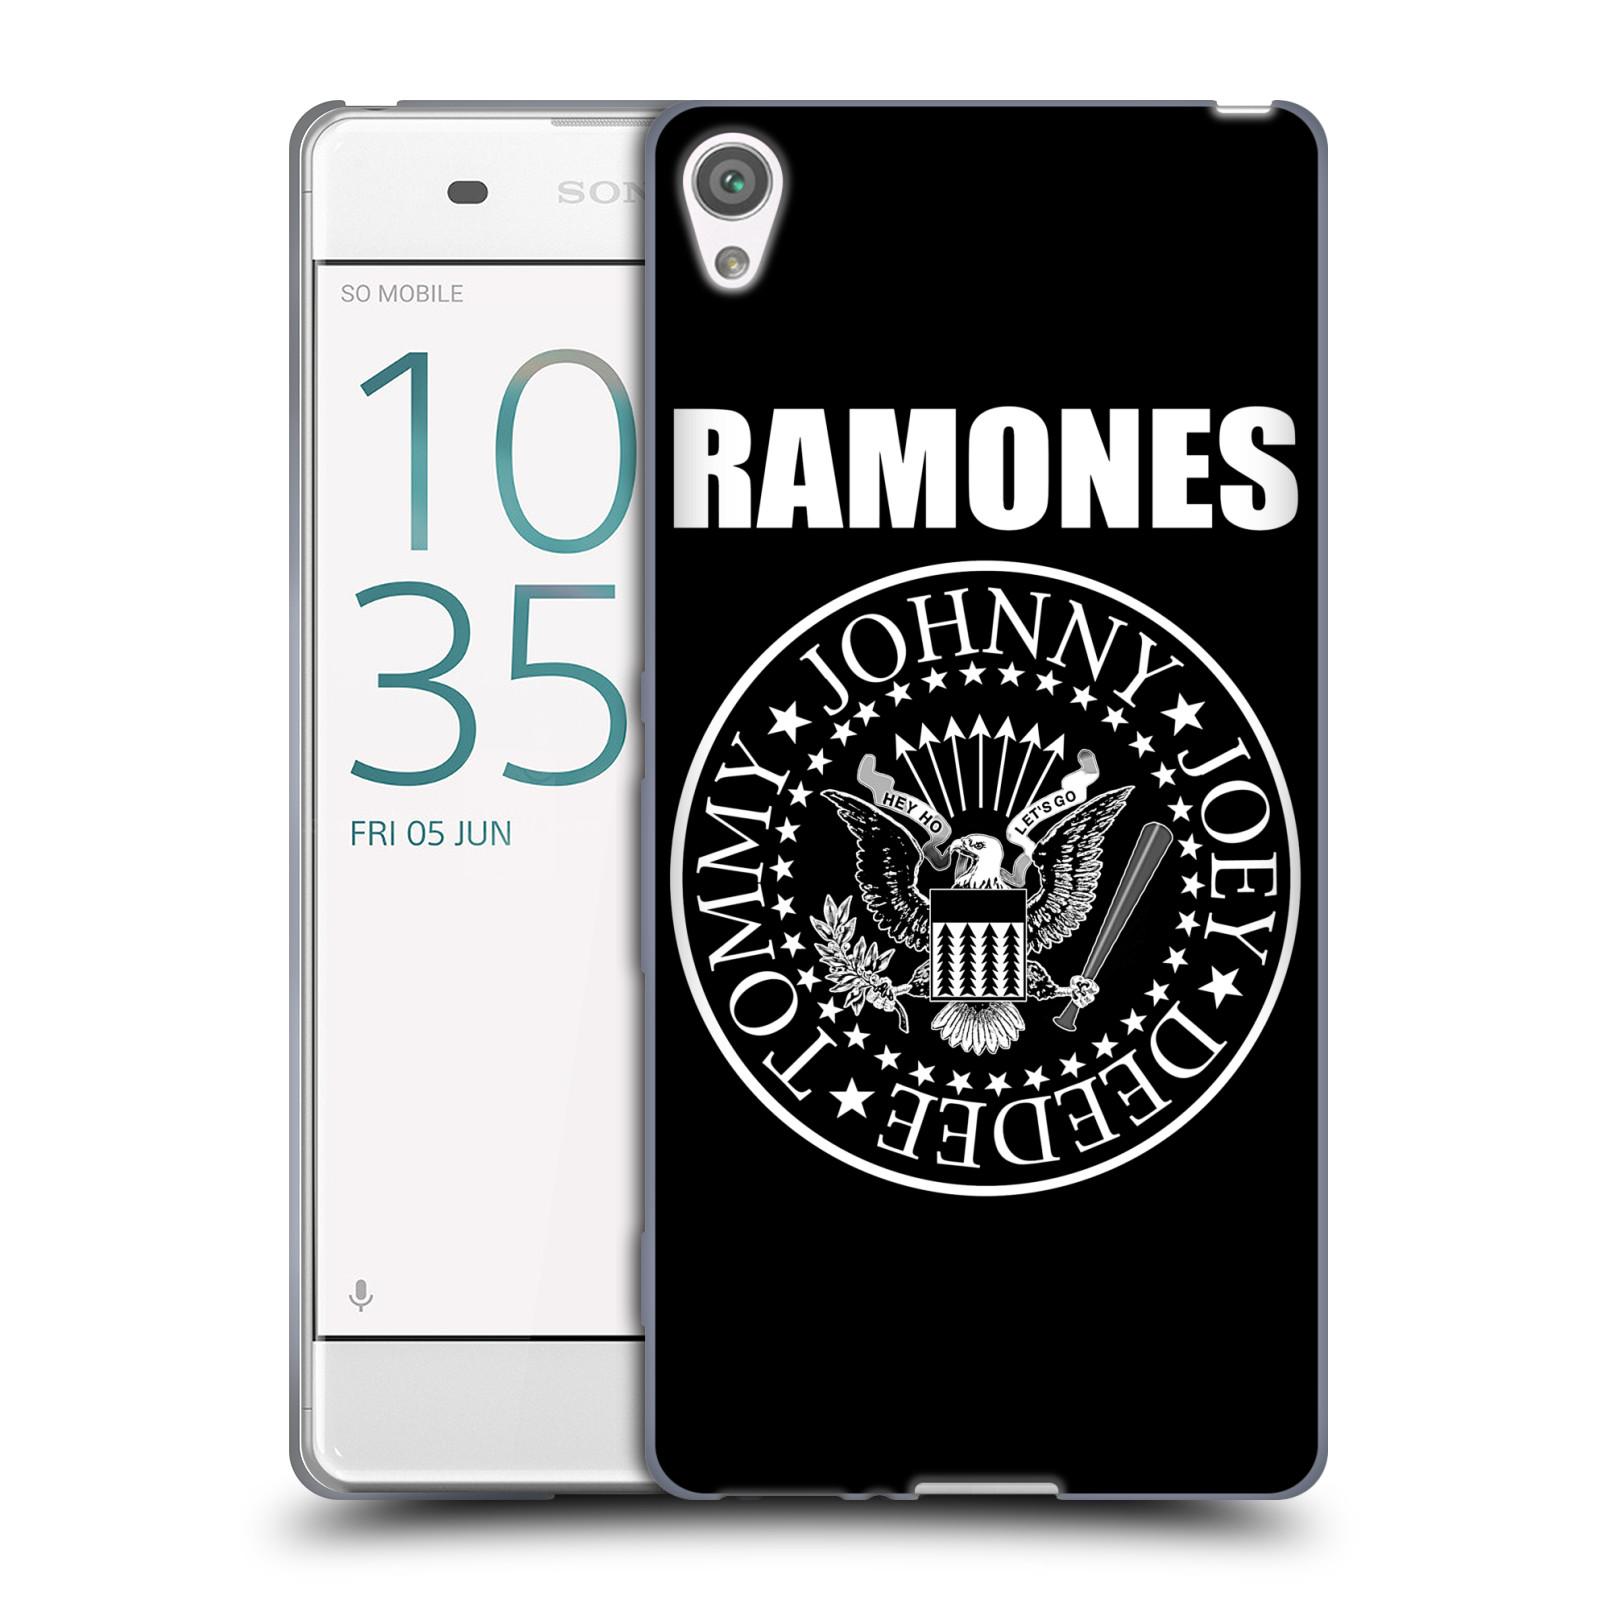 Silikonové pouzdro na mobil Sony Xperia XA HEAD CASE The Ramones - PRESIDENTIAL SEAL